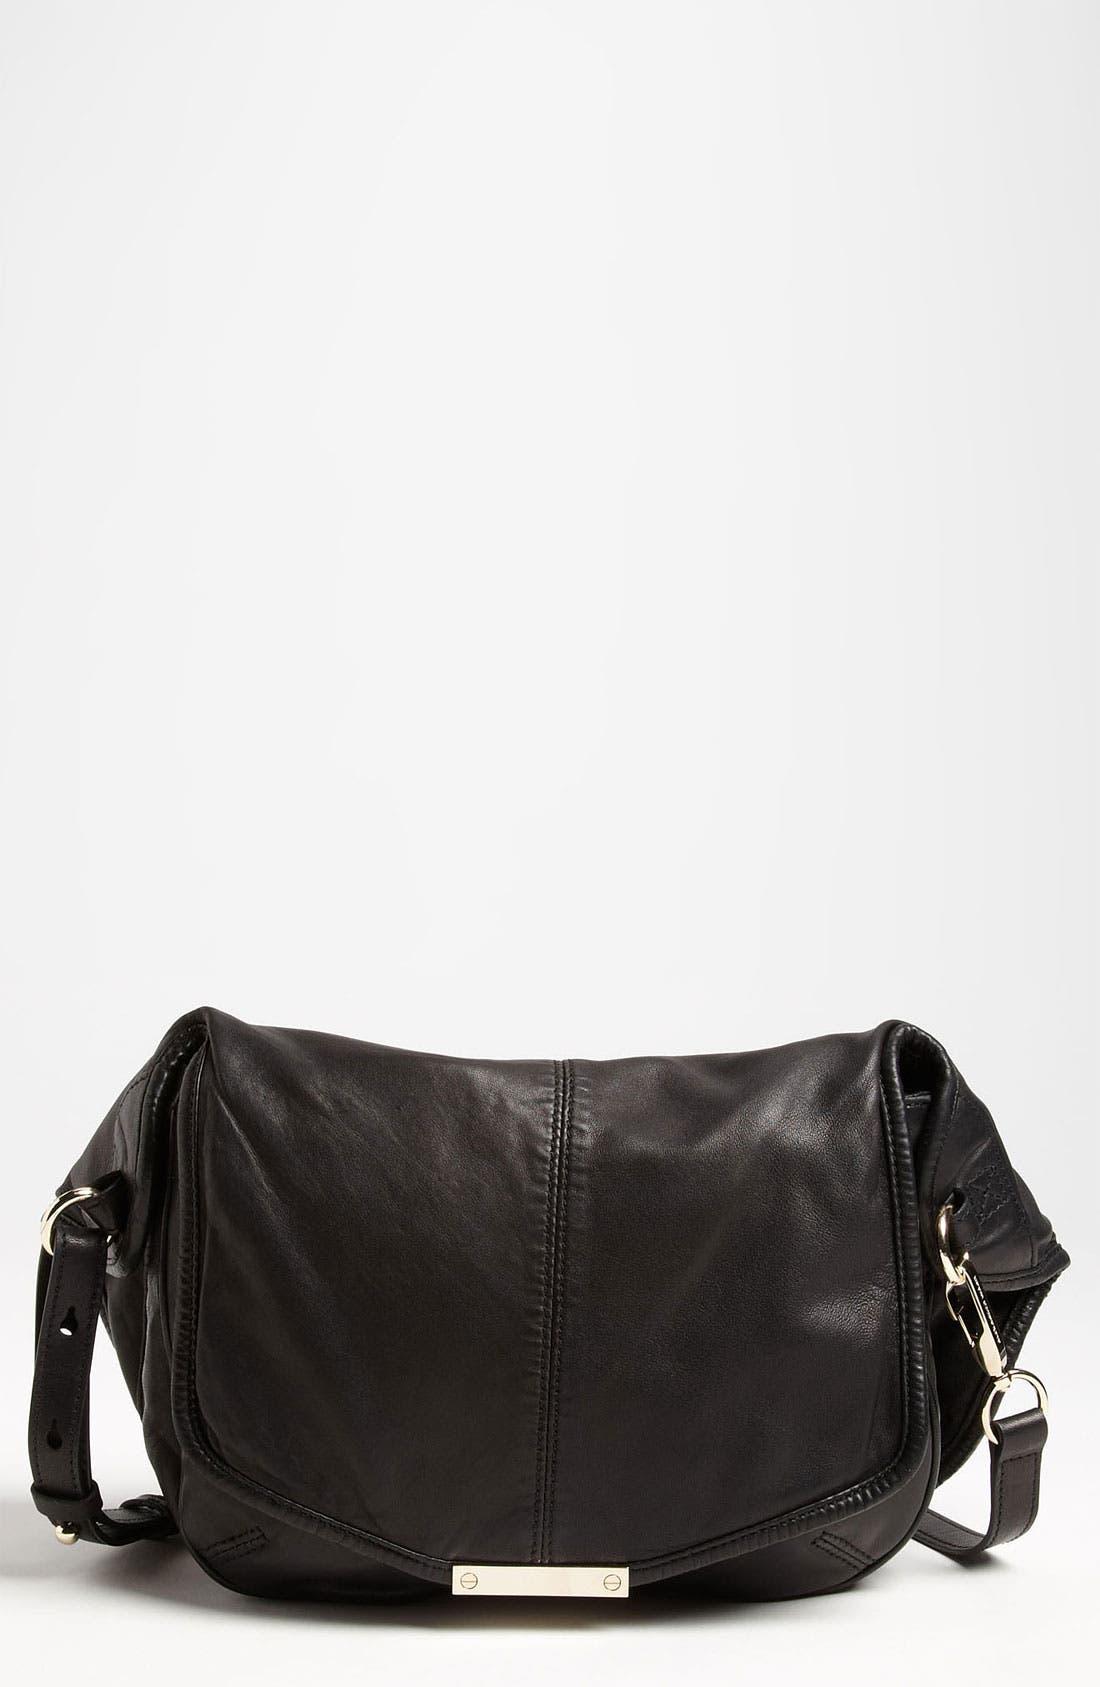 Alternate Image 1 Selected - Alexander Wang 'Iris' Leather Crossbody Bag